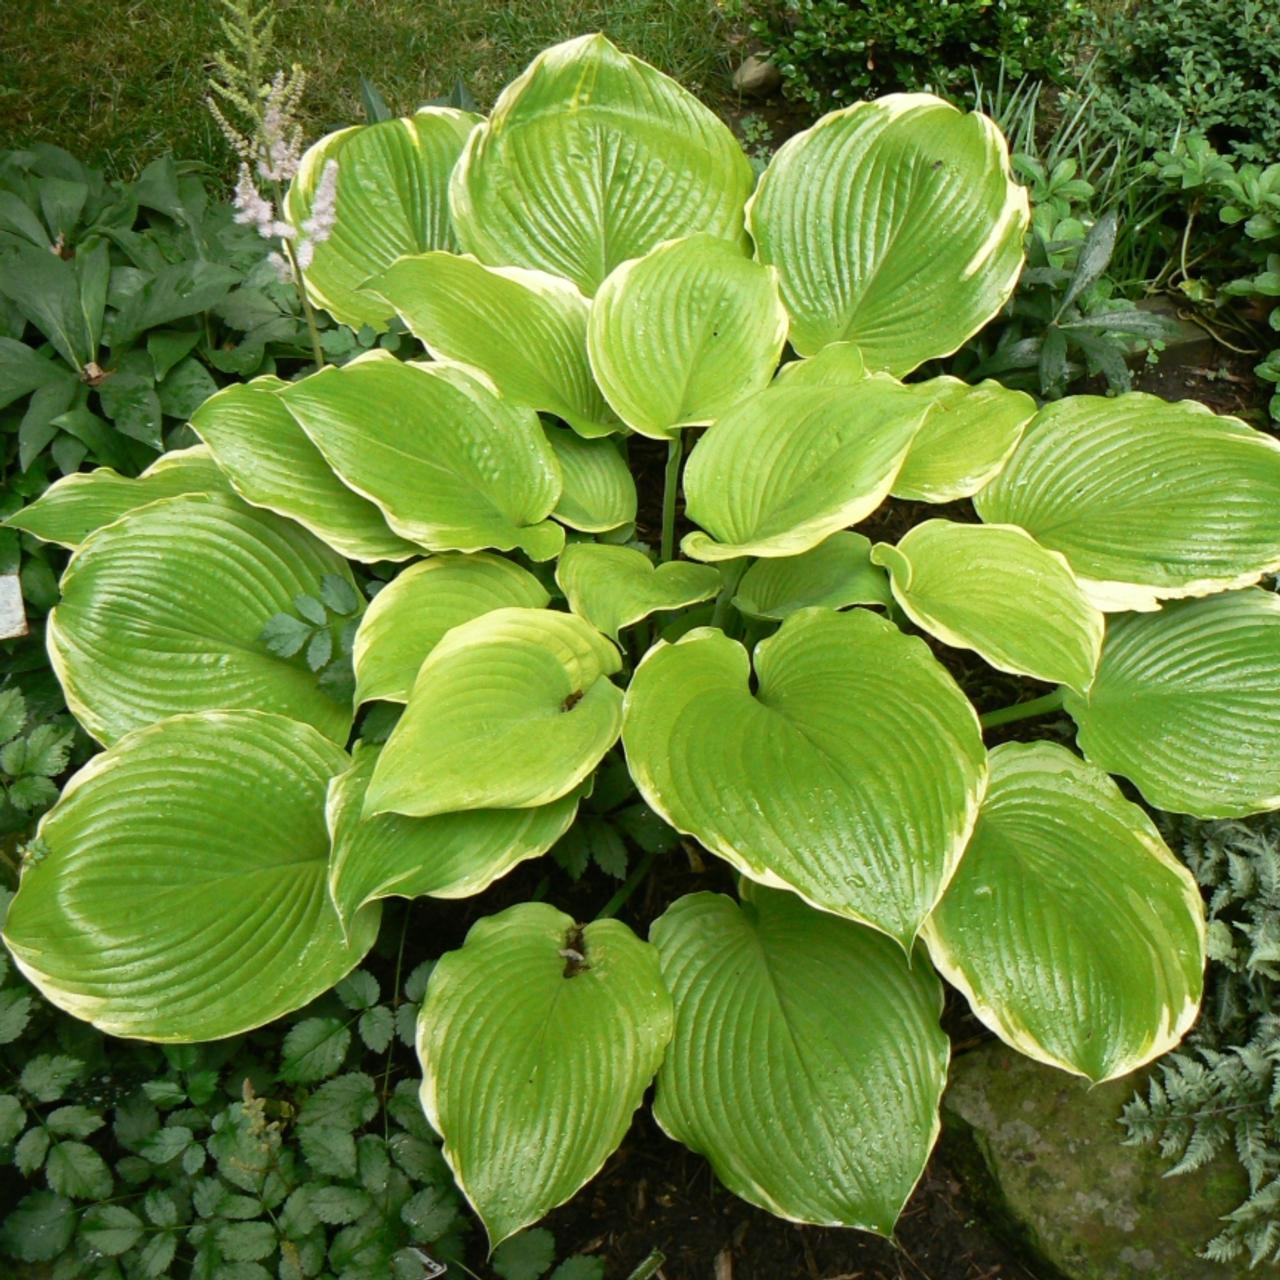 Hosta 'Winter Snow' plant